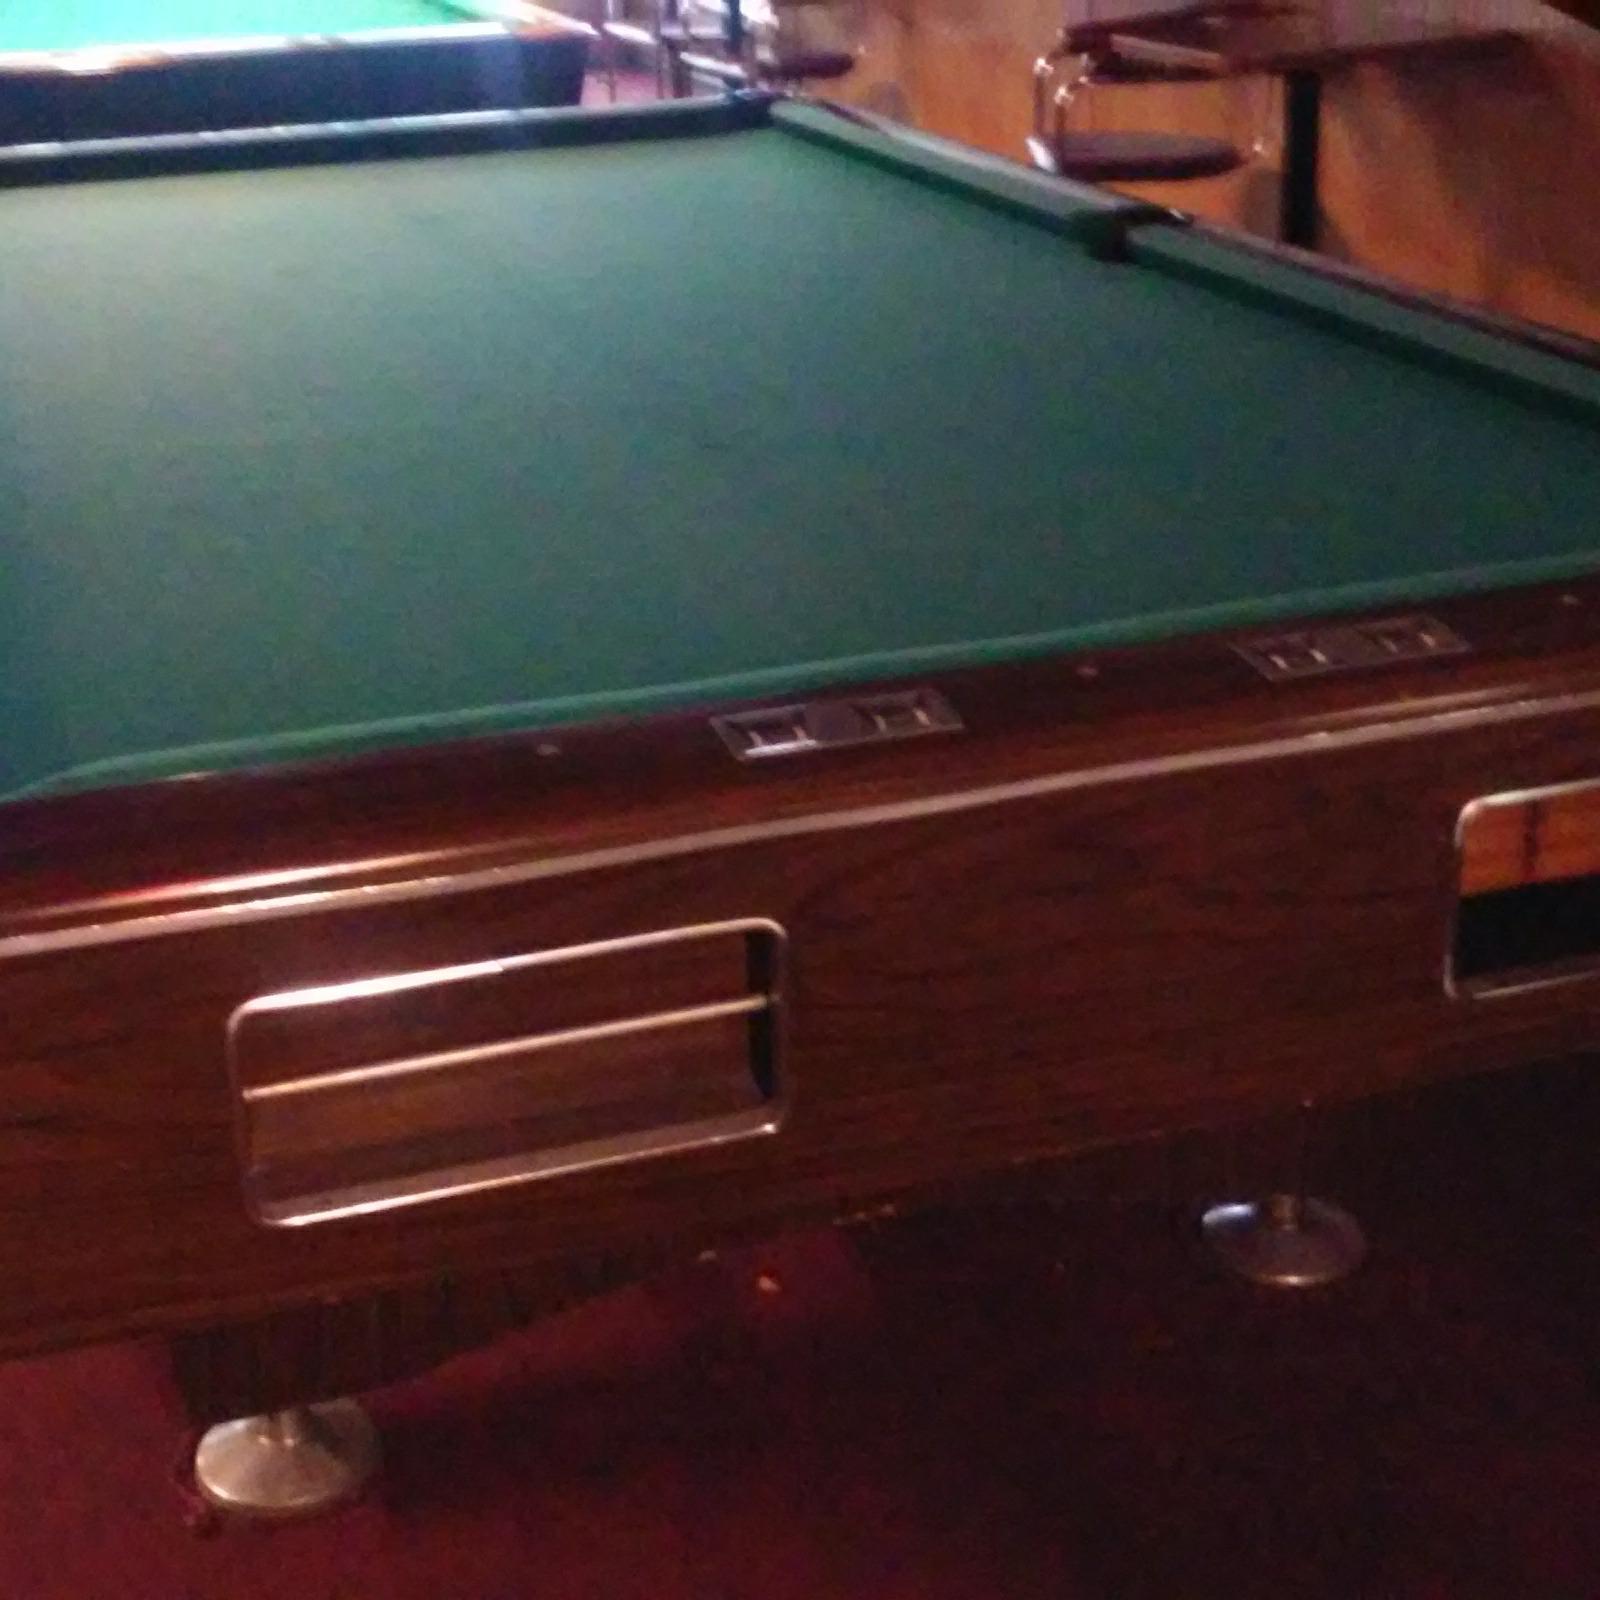 Chris and Toms Billiard Service - Spokane, WA - Sports Clubs